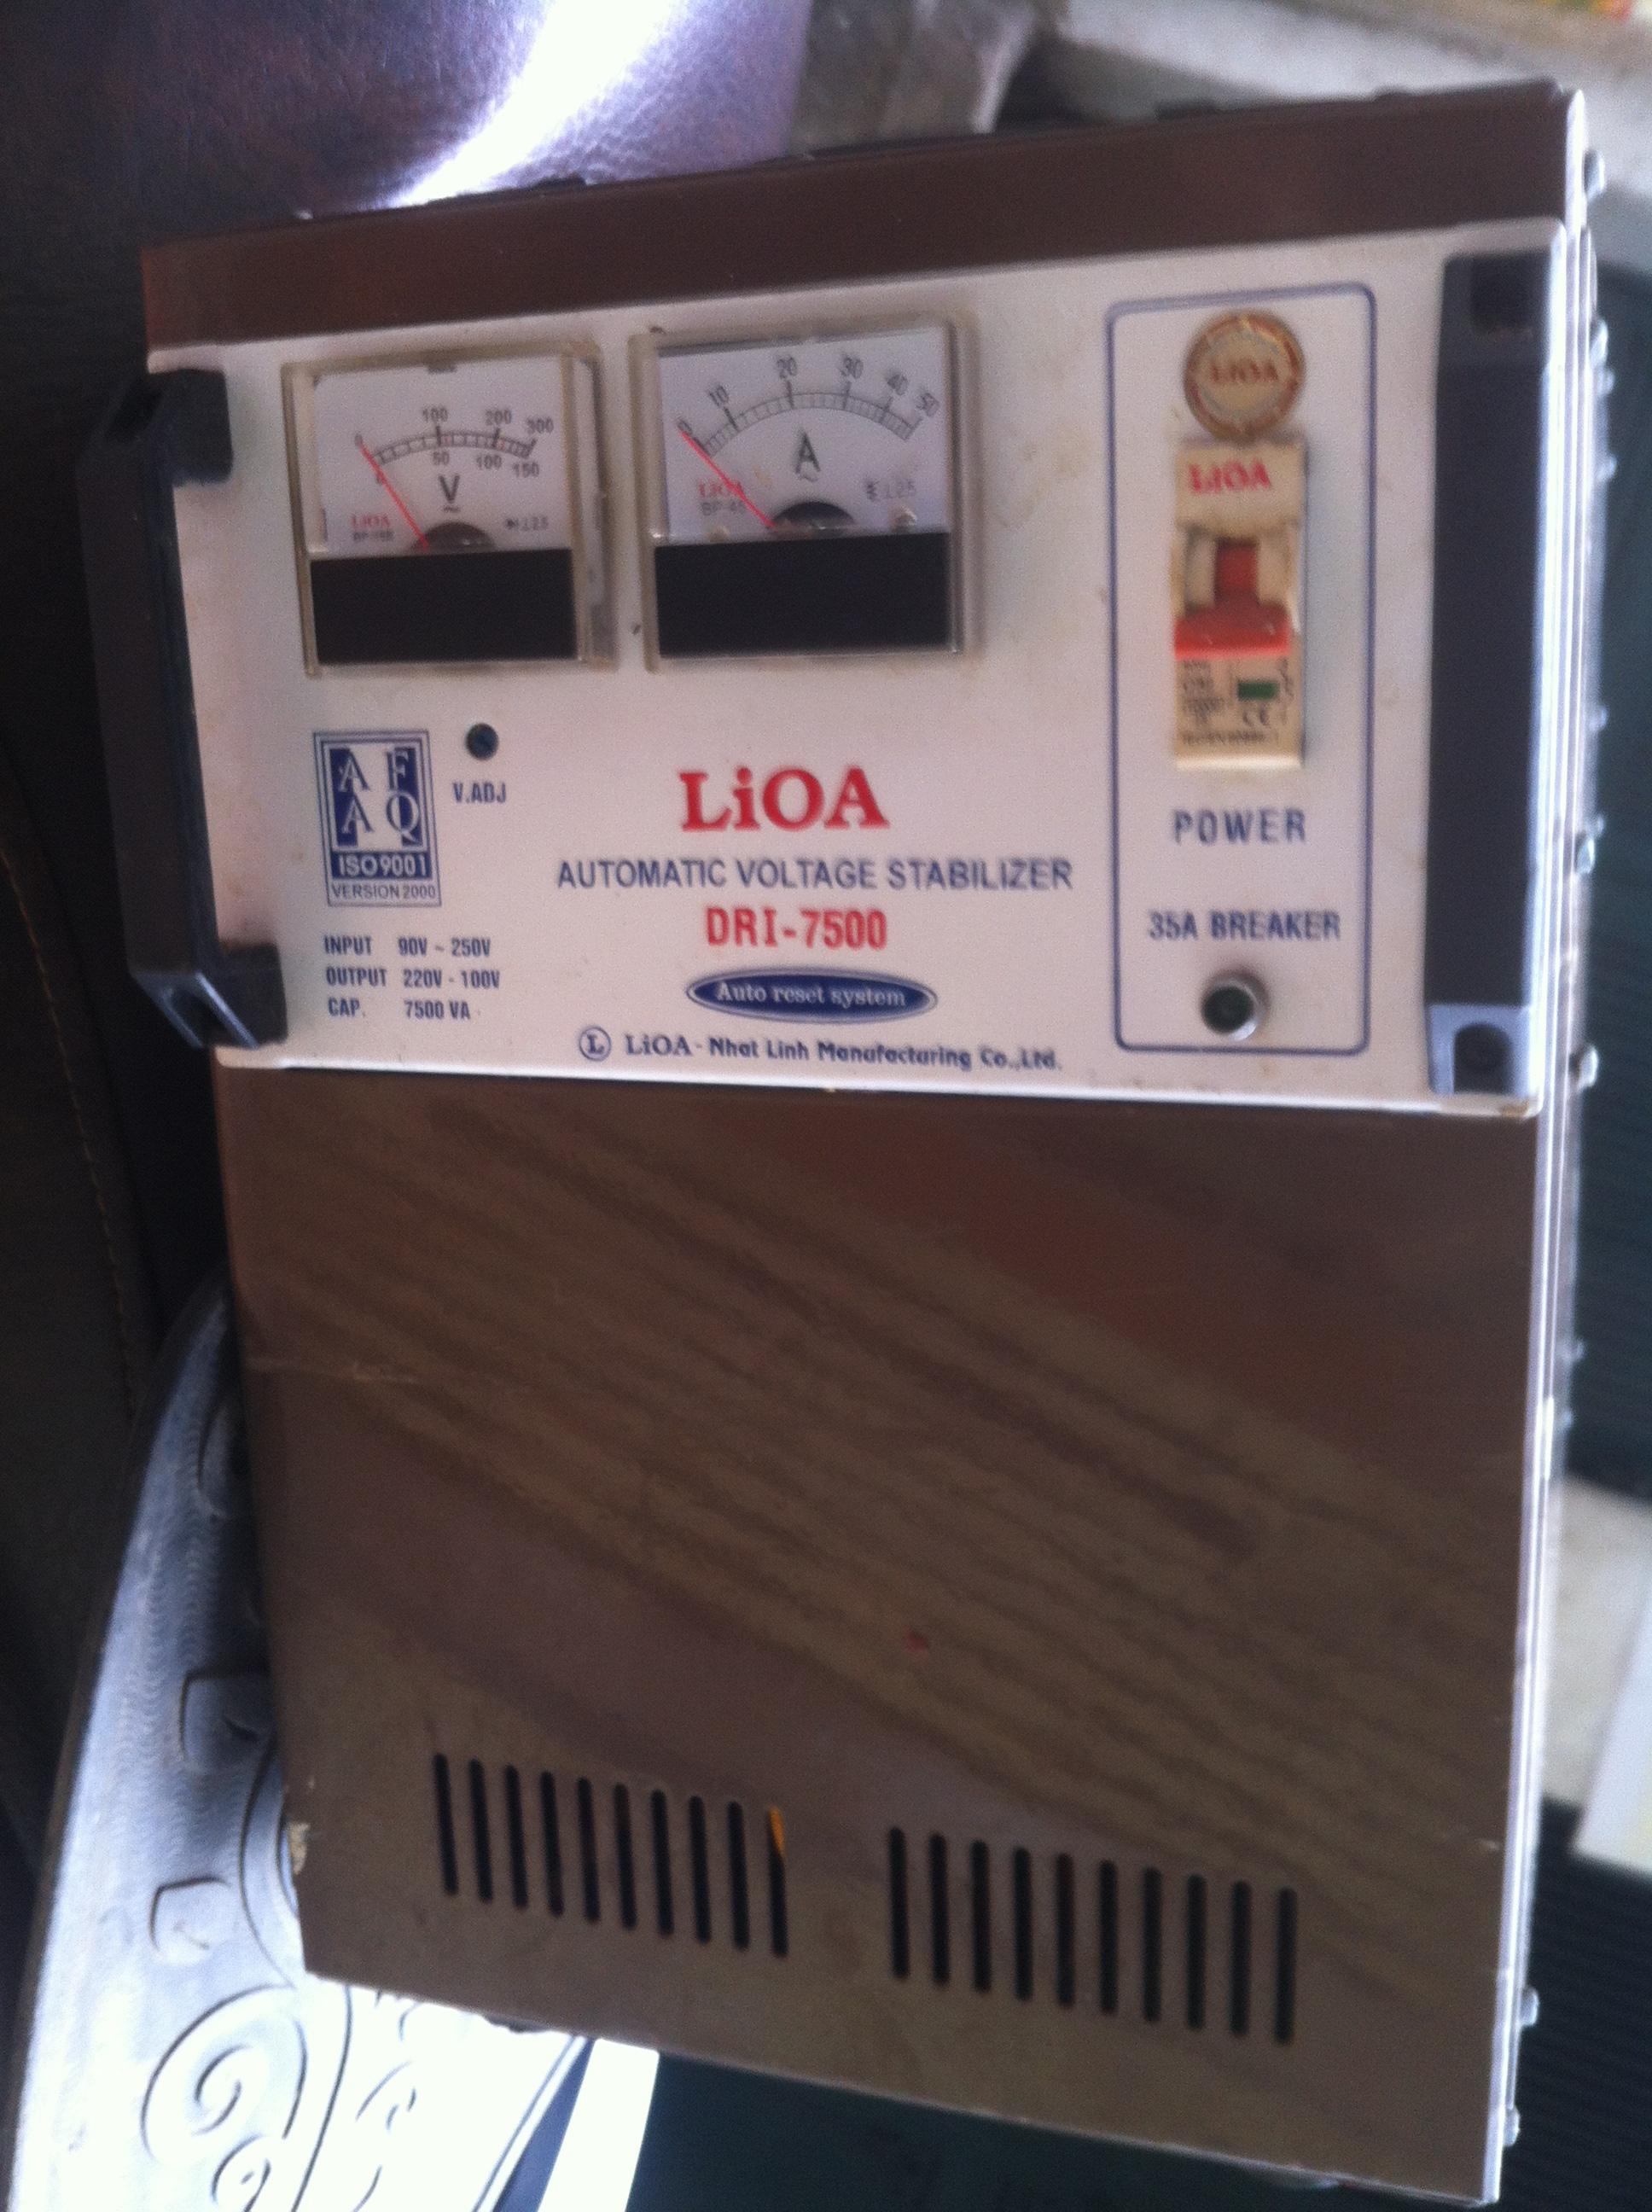 11 Bán lioa 1KW, 2 kW, 3 KW, 4 KW, 5 KW, 10KW